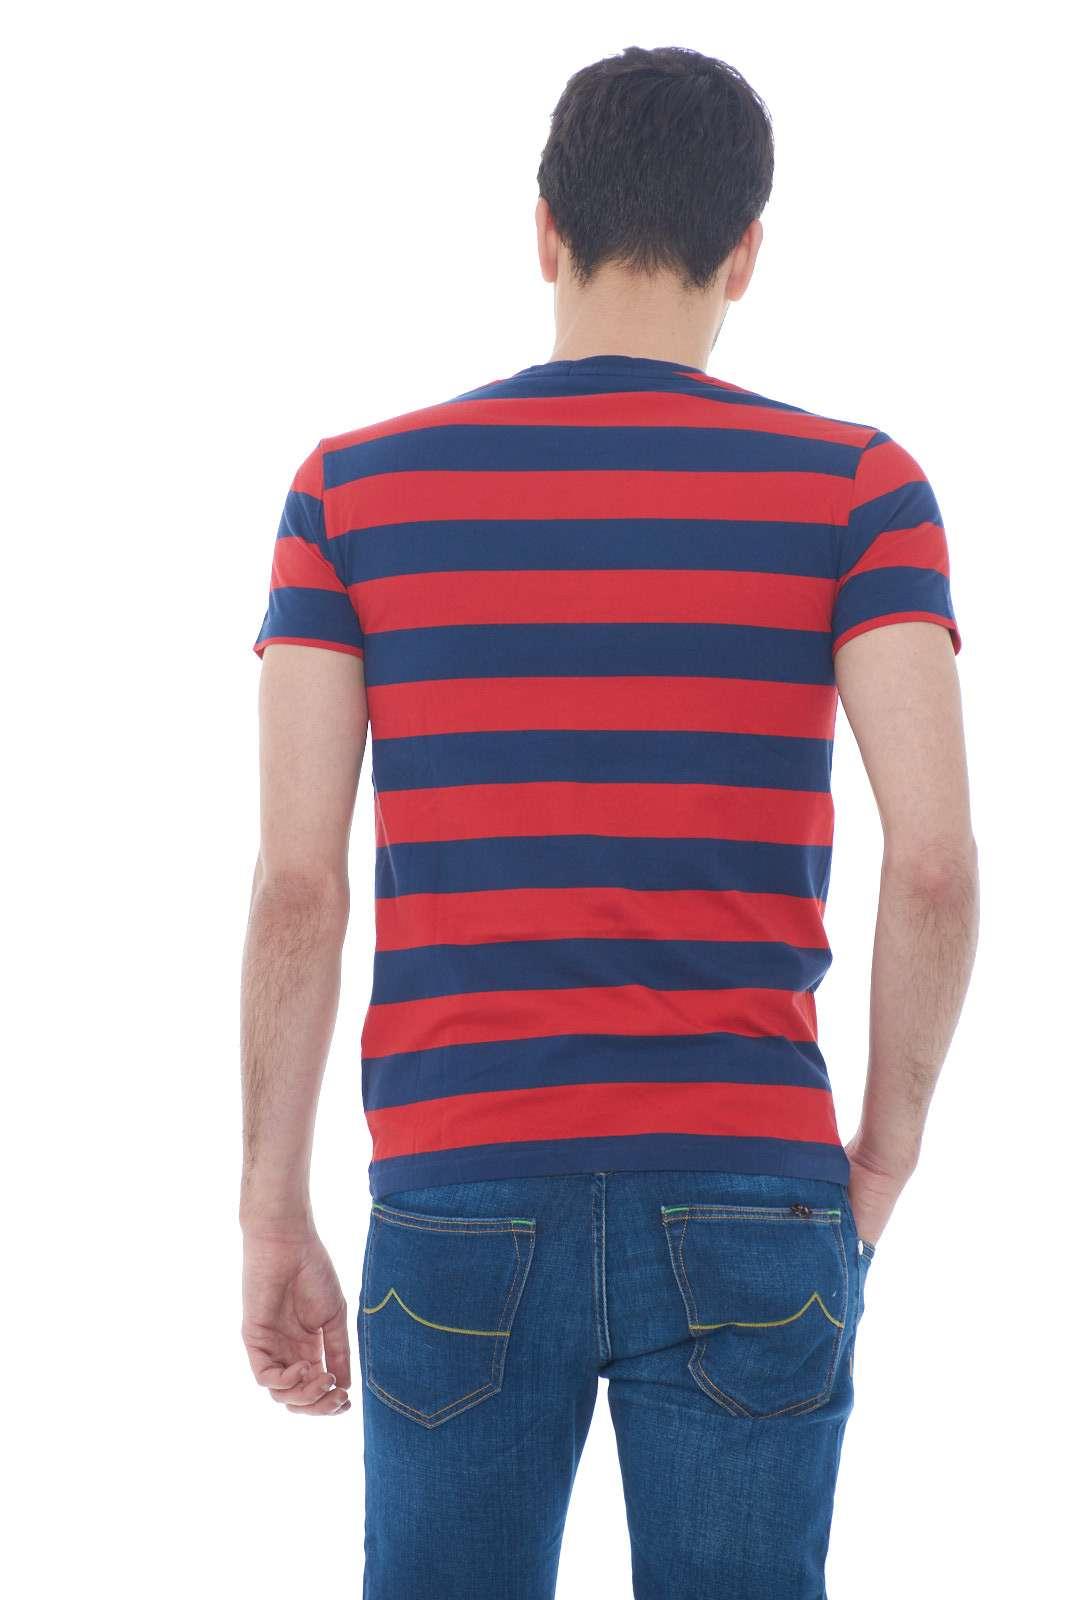 https://www.parmax.com/media/catalog/product/a/i/PE-outlet_parmax-t-shirt-uomo-Raph-Lauren-710740882-C.jpg